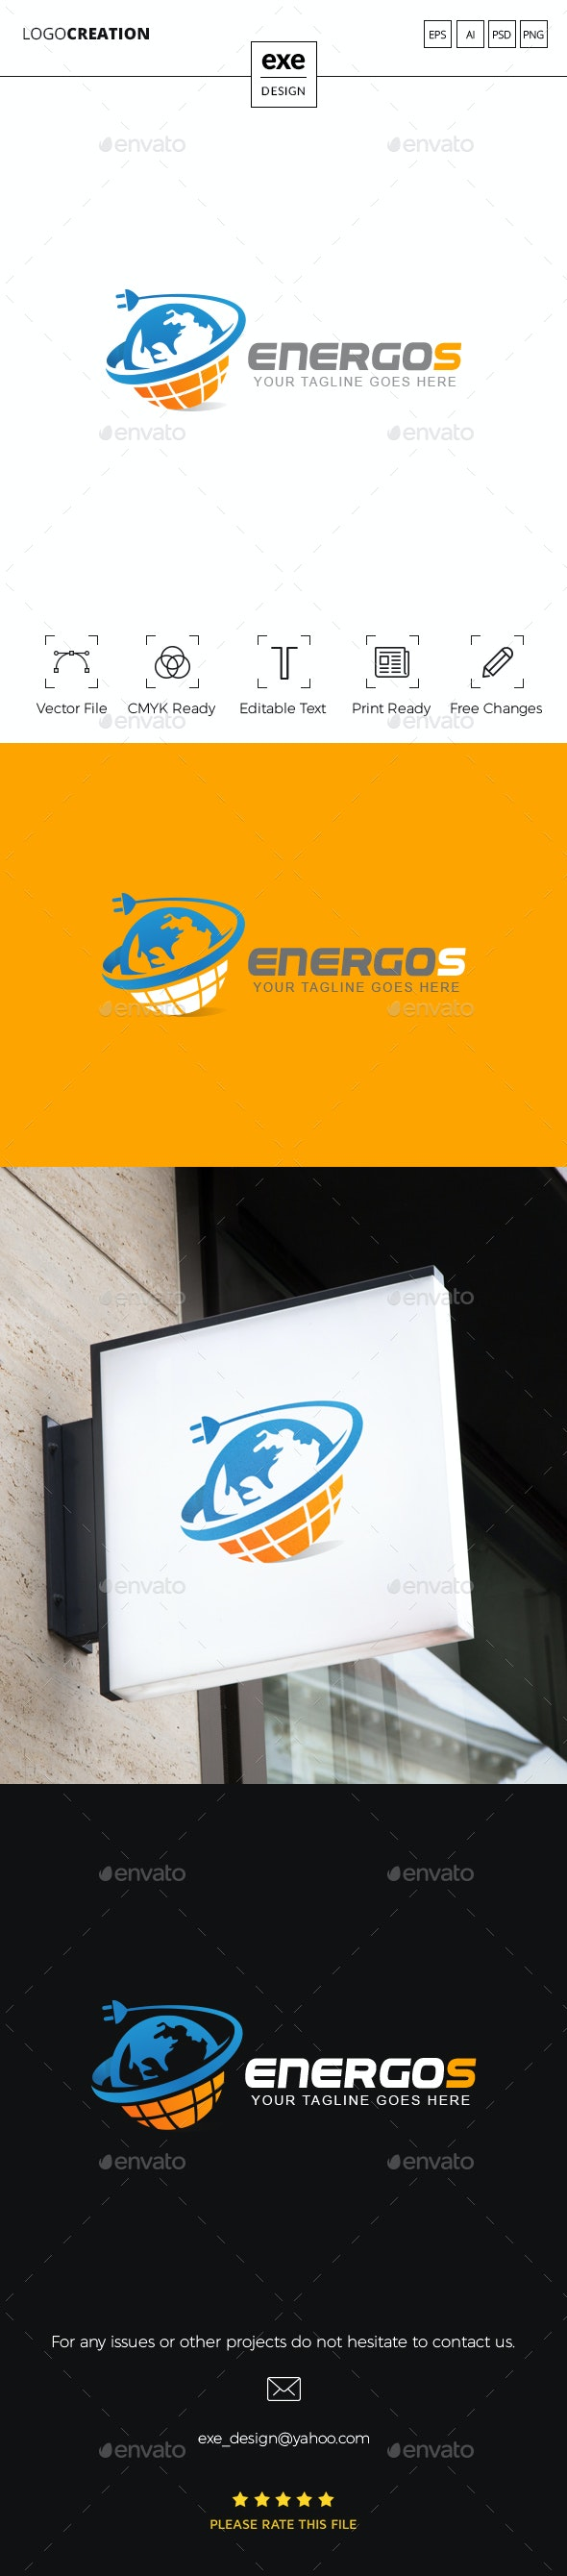 Energy Planet Logo - Vector Abstract